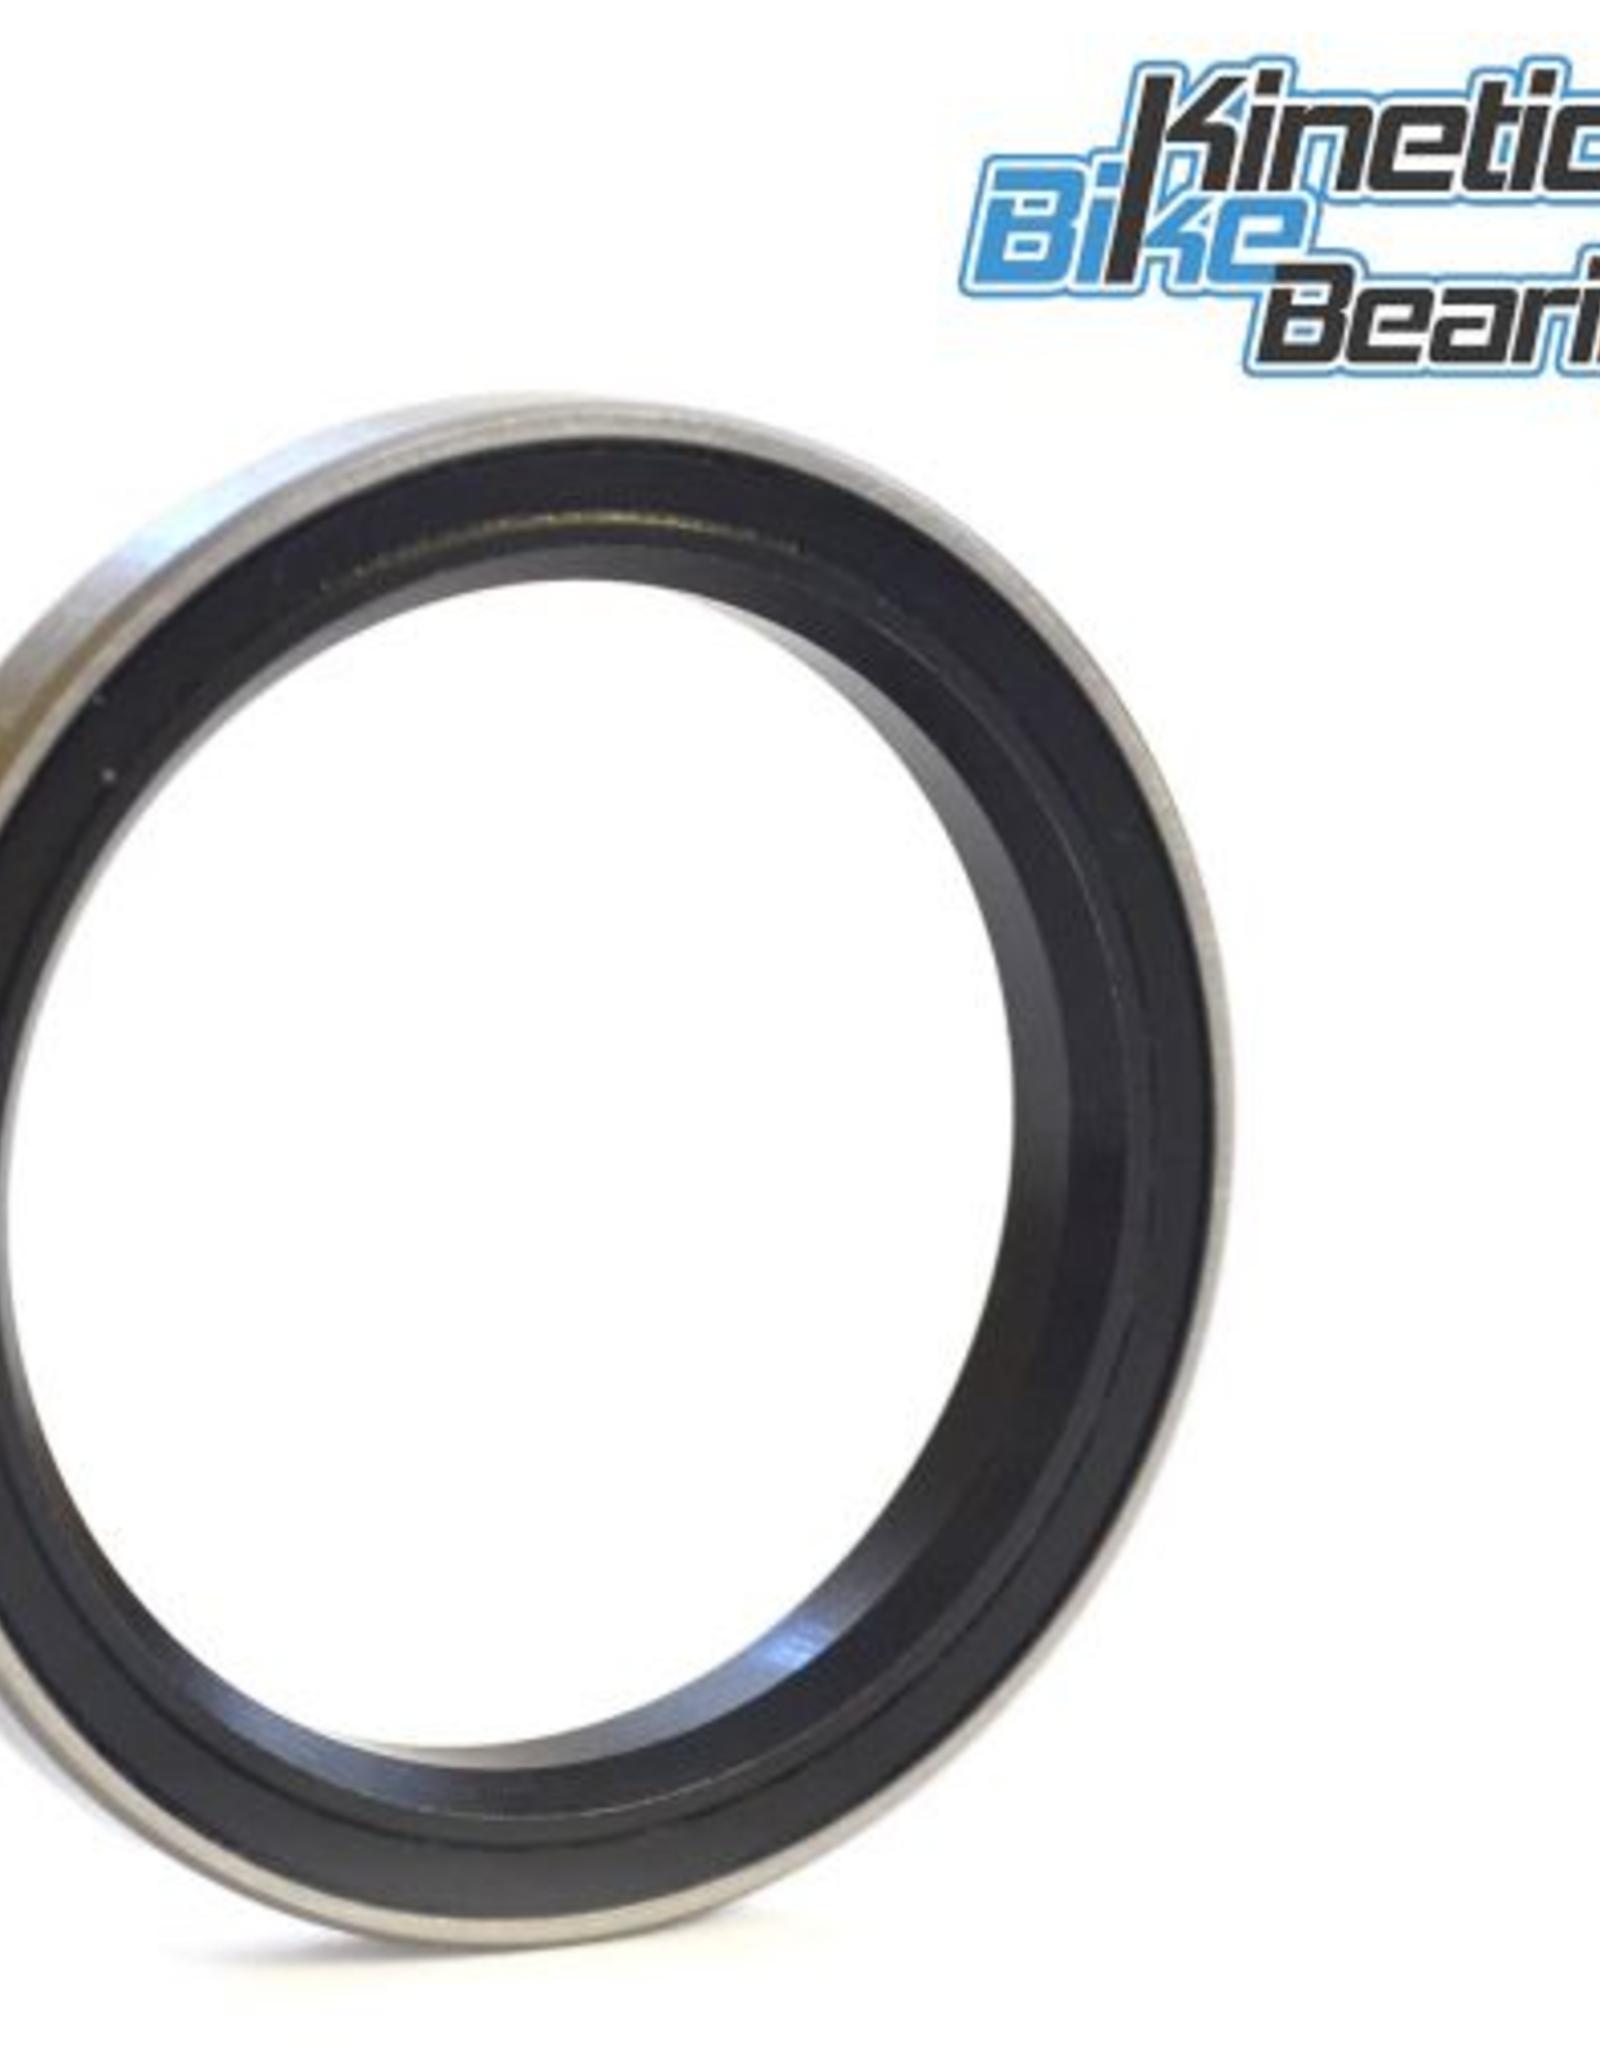 Kinetic Bearings Headset bearing P16H8 40 x 52 x 8mm